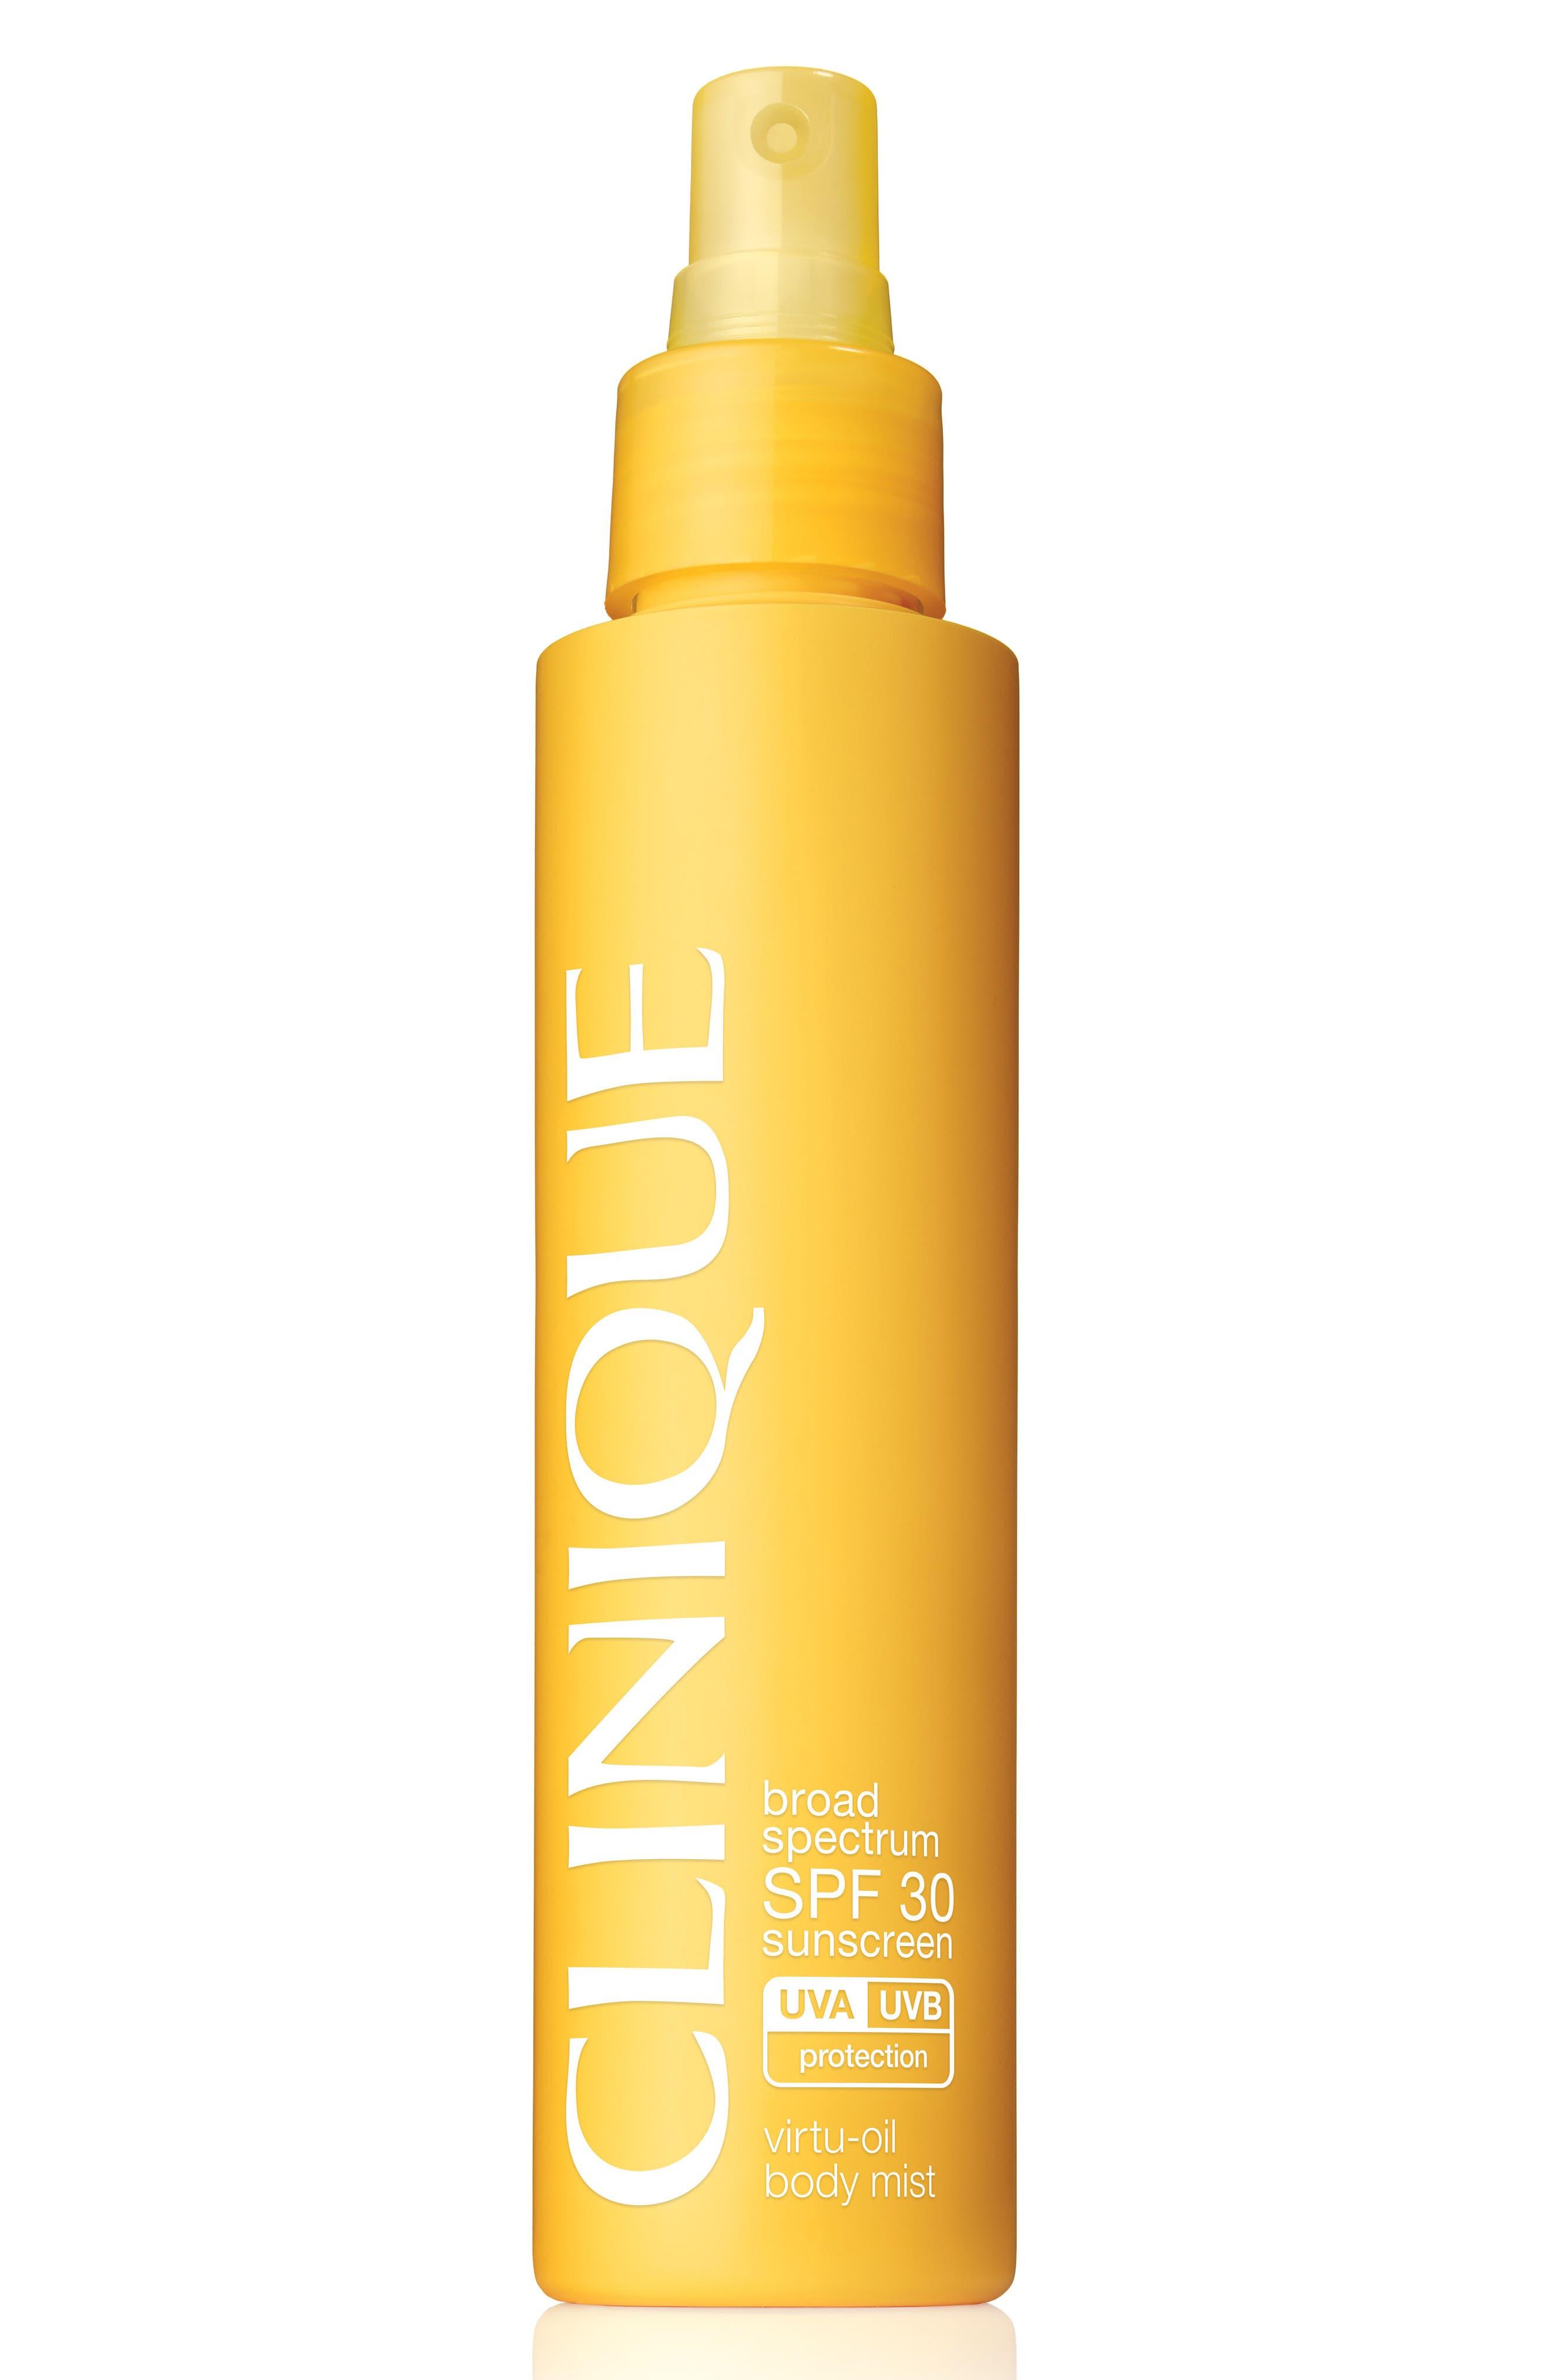 Broad Spectrum SPF 30 Sunscreen Vitru-Oil Body Mist,                         Main,                         color, NO COLOR